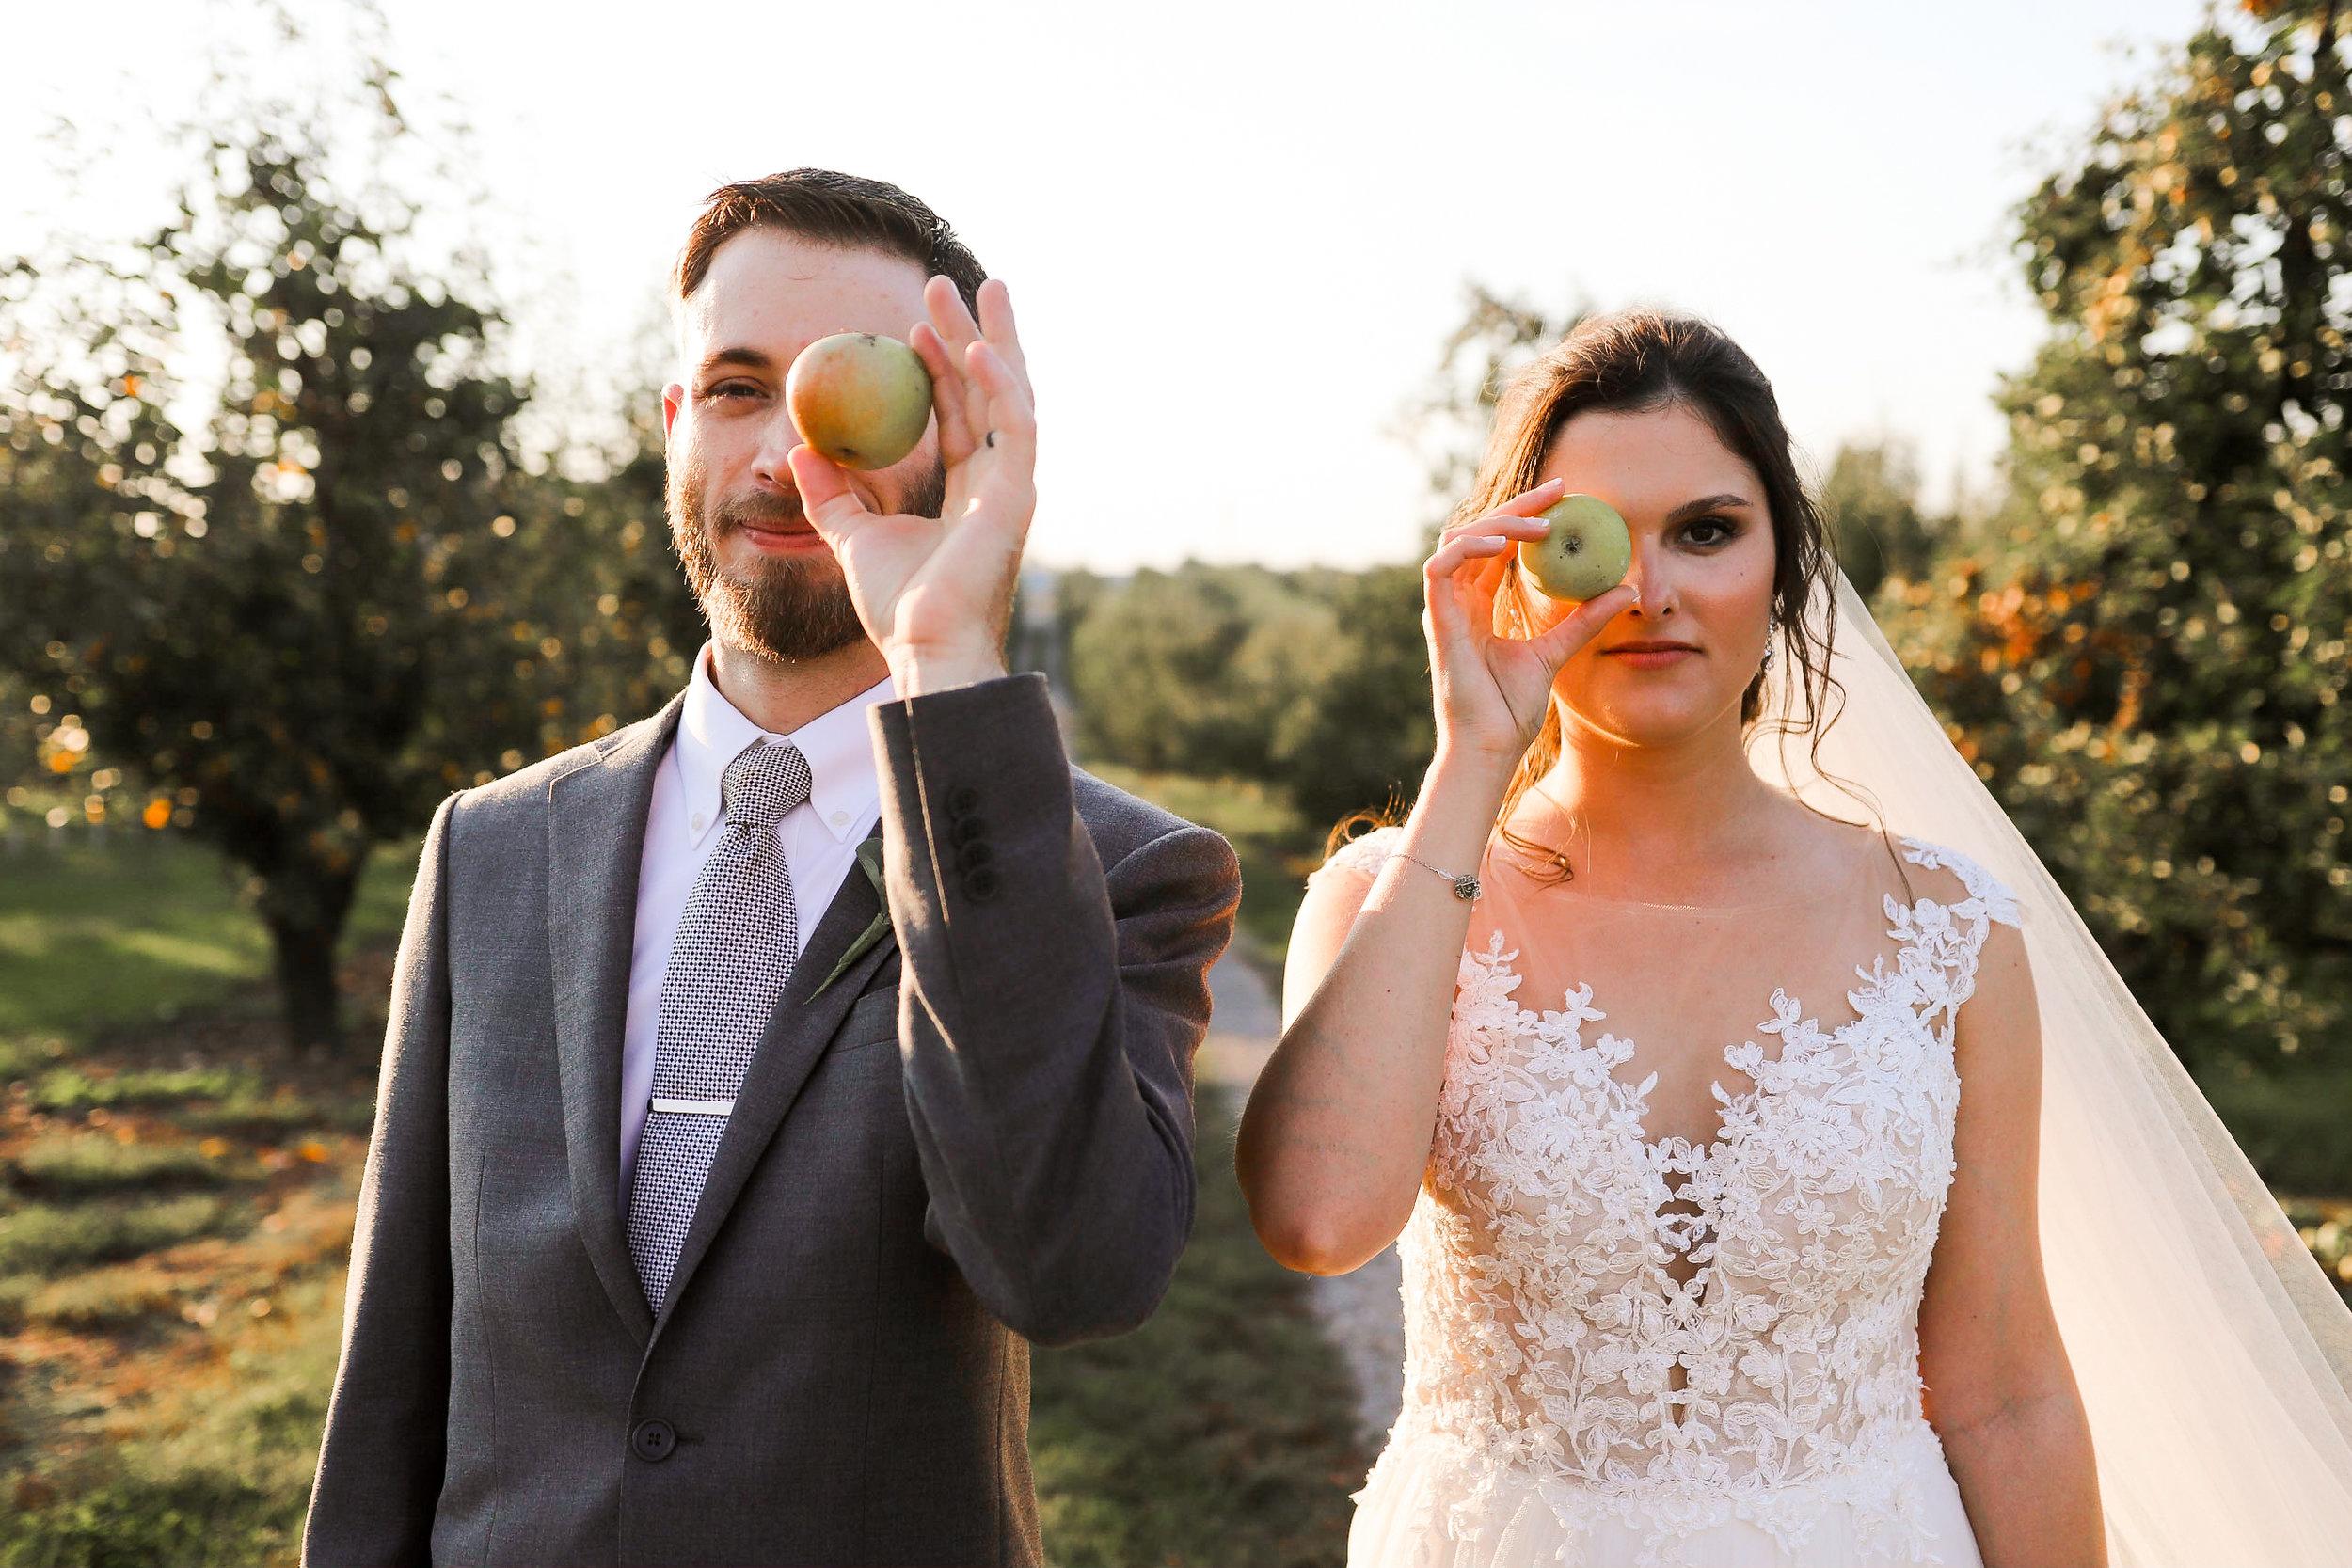 Evans-Orchard-Lexington-Kentucky-Fall-Wedding-27.jpg